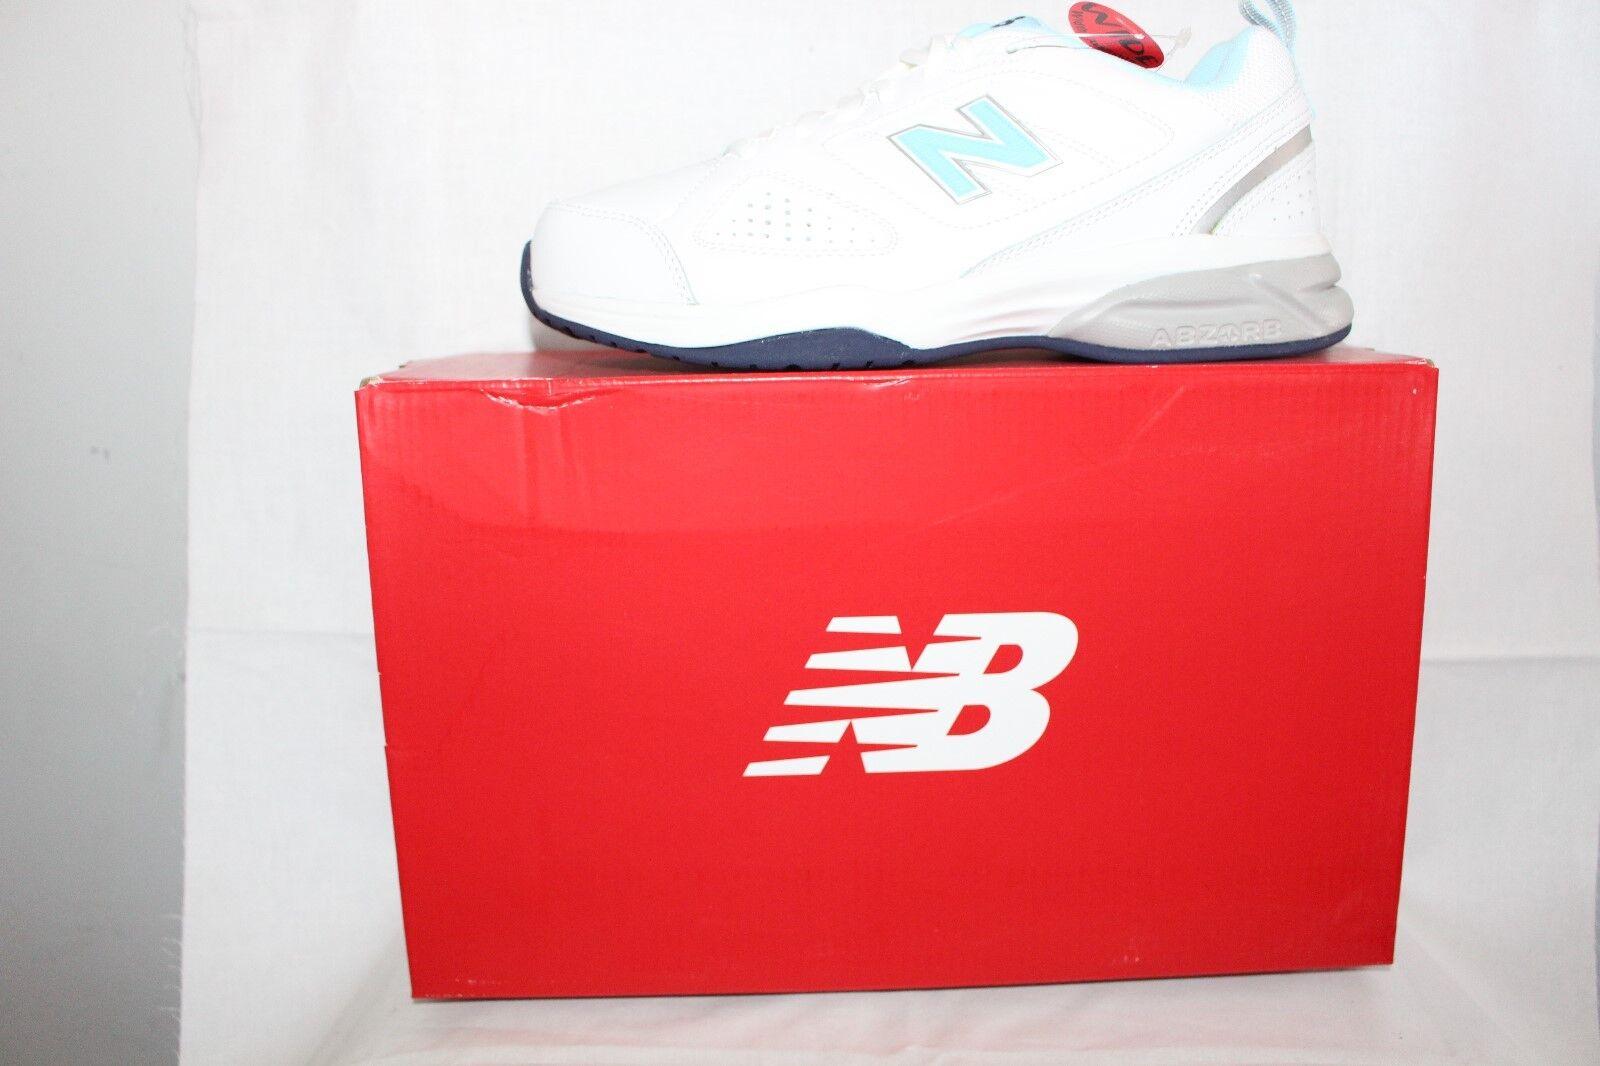 Damas Zapatos Calzado-New Balance Chándal Chándal Chándal WX624 blancoo 0b7bf2